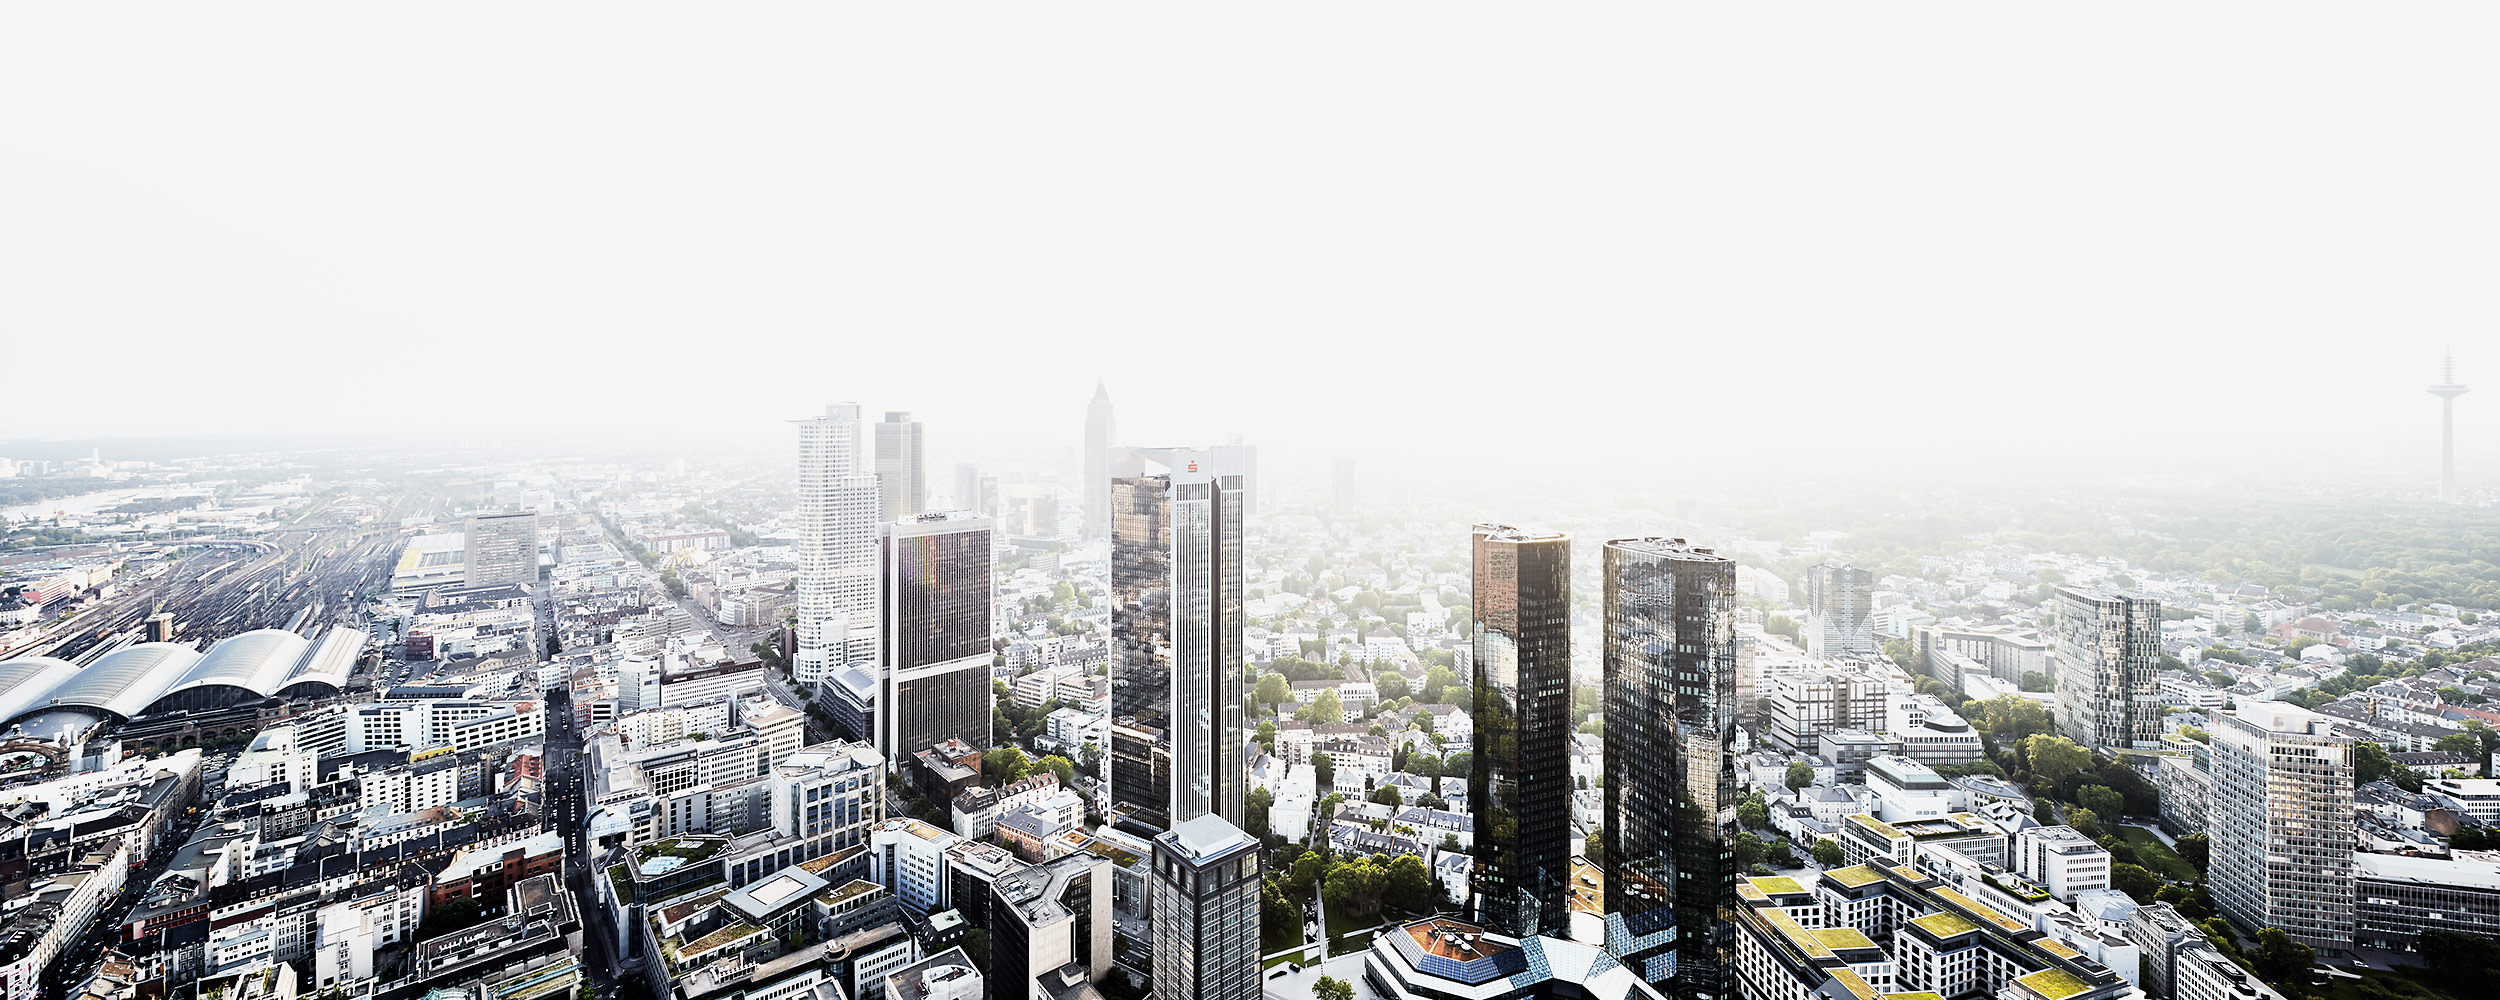 Architekturfotograf Frankfurt, Skyline, Frankfurt am Main